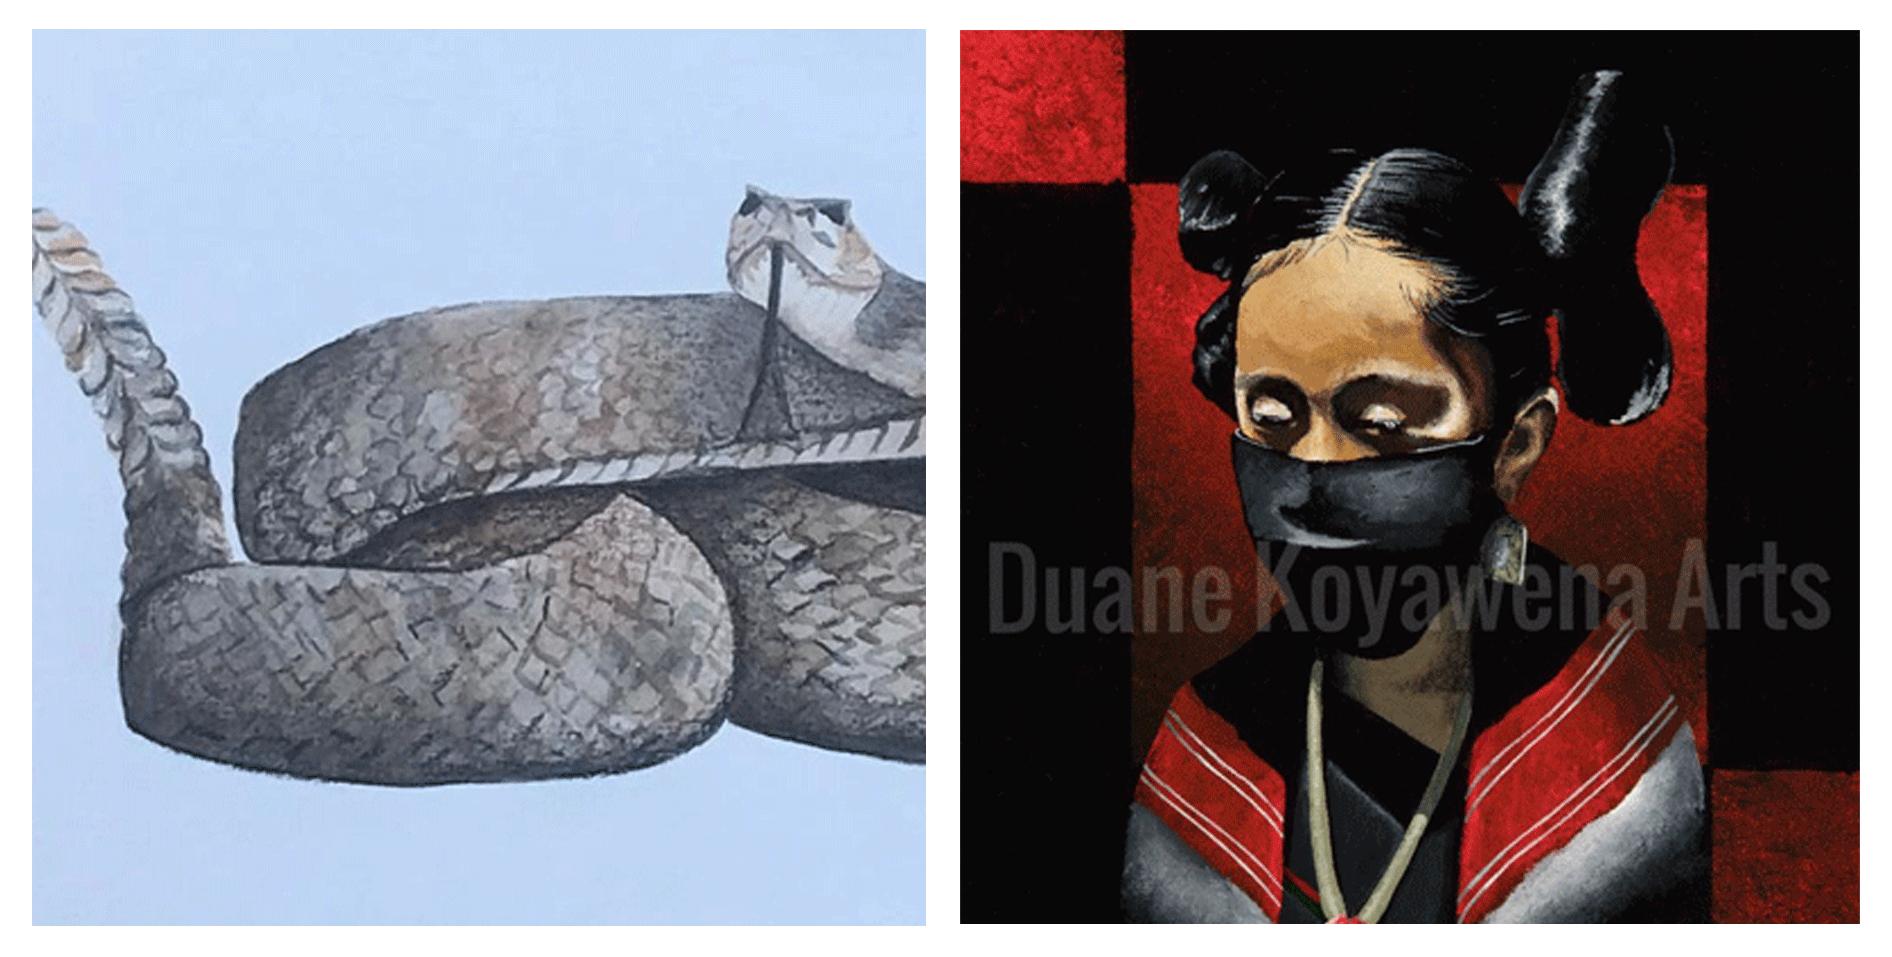 merci two deserts rattlesnake art and duane koyawena painting of hopi girl in red and black